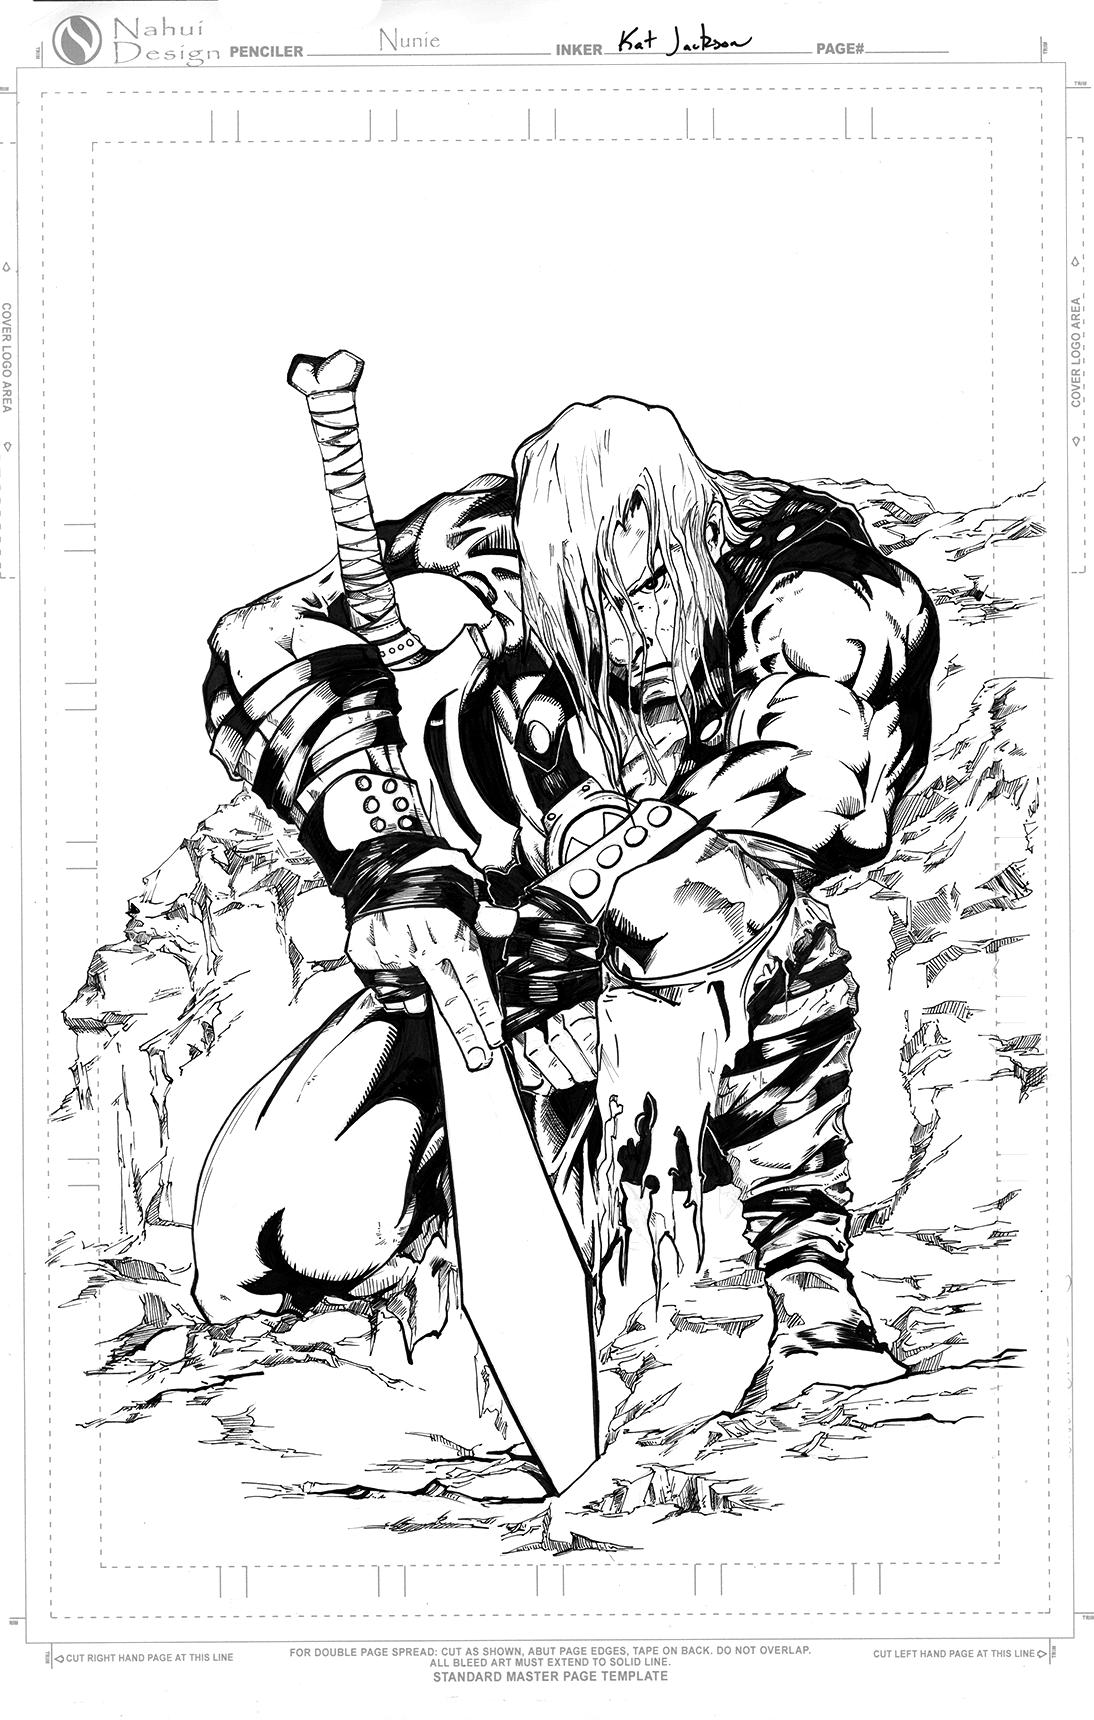 Inktober Day 1: He-Man Inks by Ahkward